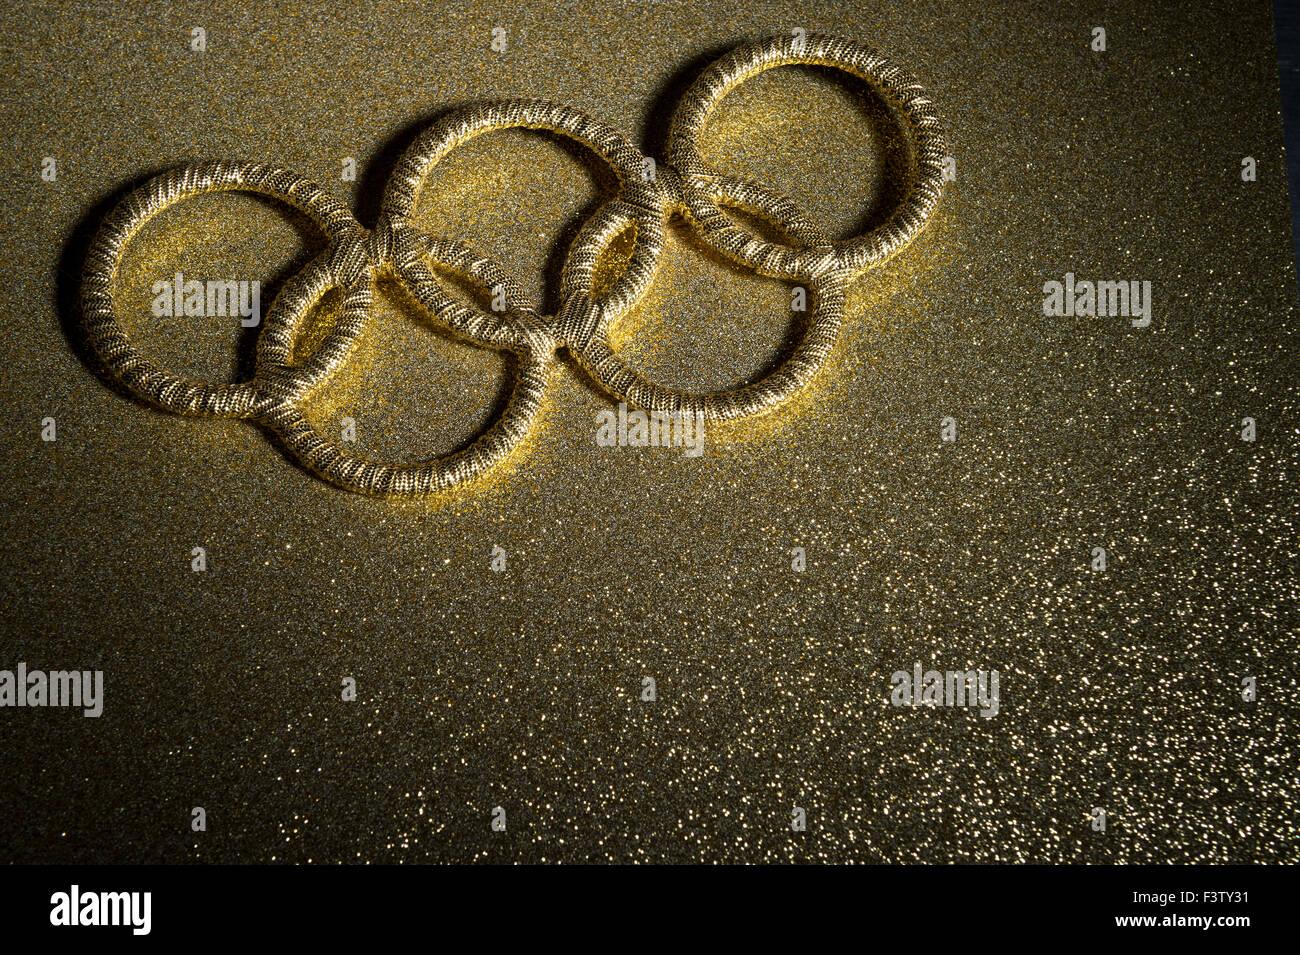 RIO DE JANEIRO, BRAZIL - FEBRUARY 3, 2015: Gold Olympic rings symbol sits spotlit on shiny golden background. - Stock Image